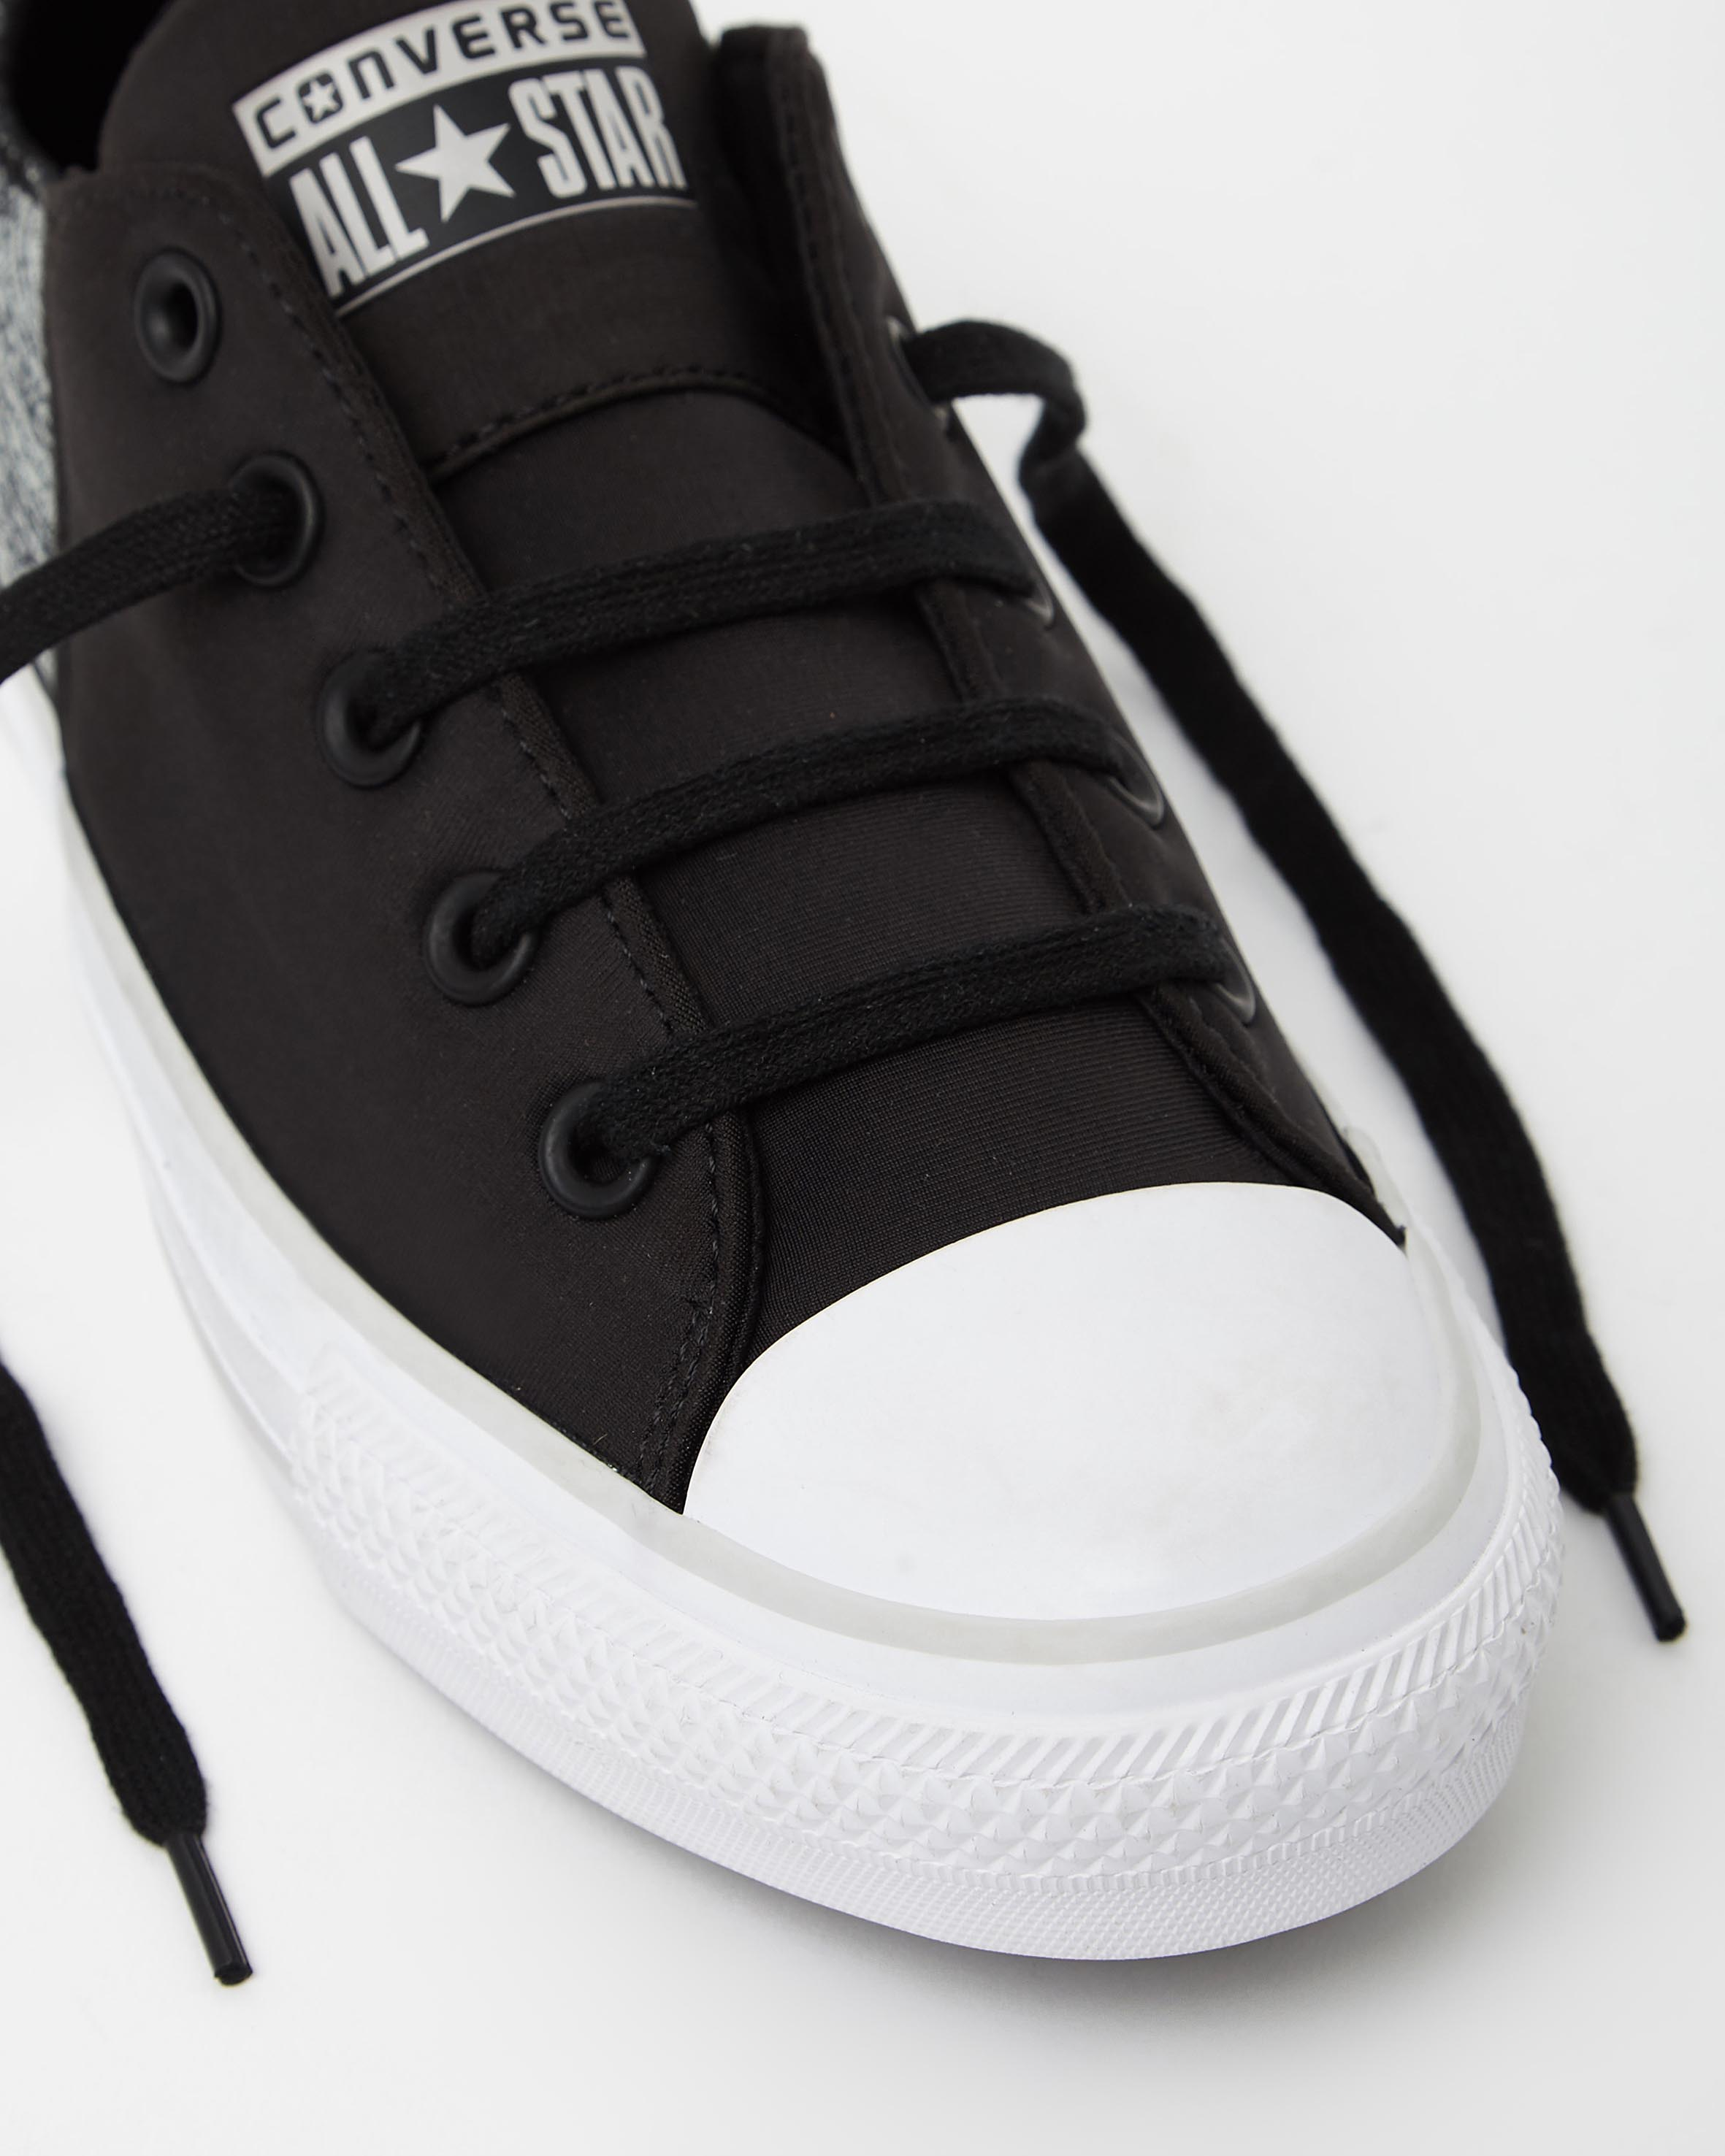 Elástico Dictar el fin  Chuck Taylor All Star Abbey Neoprene | Sneaker Store - 95Gallery.com